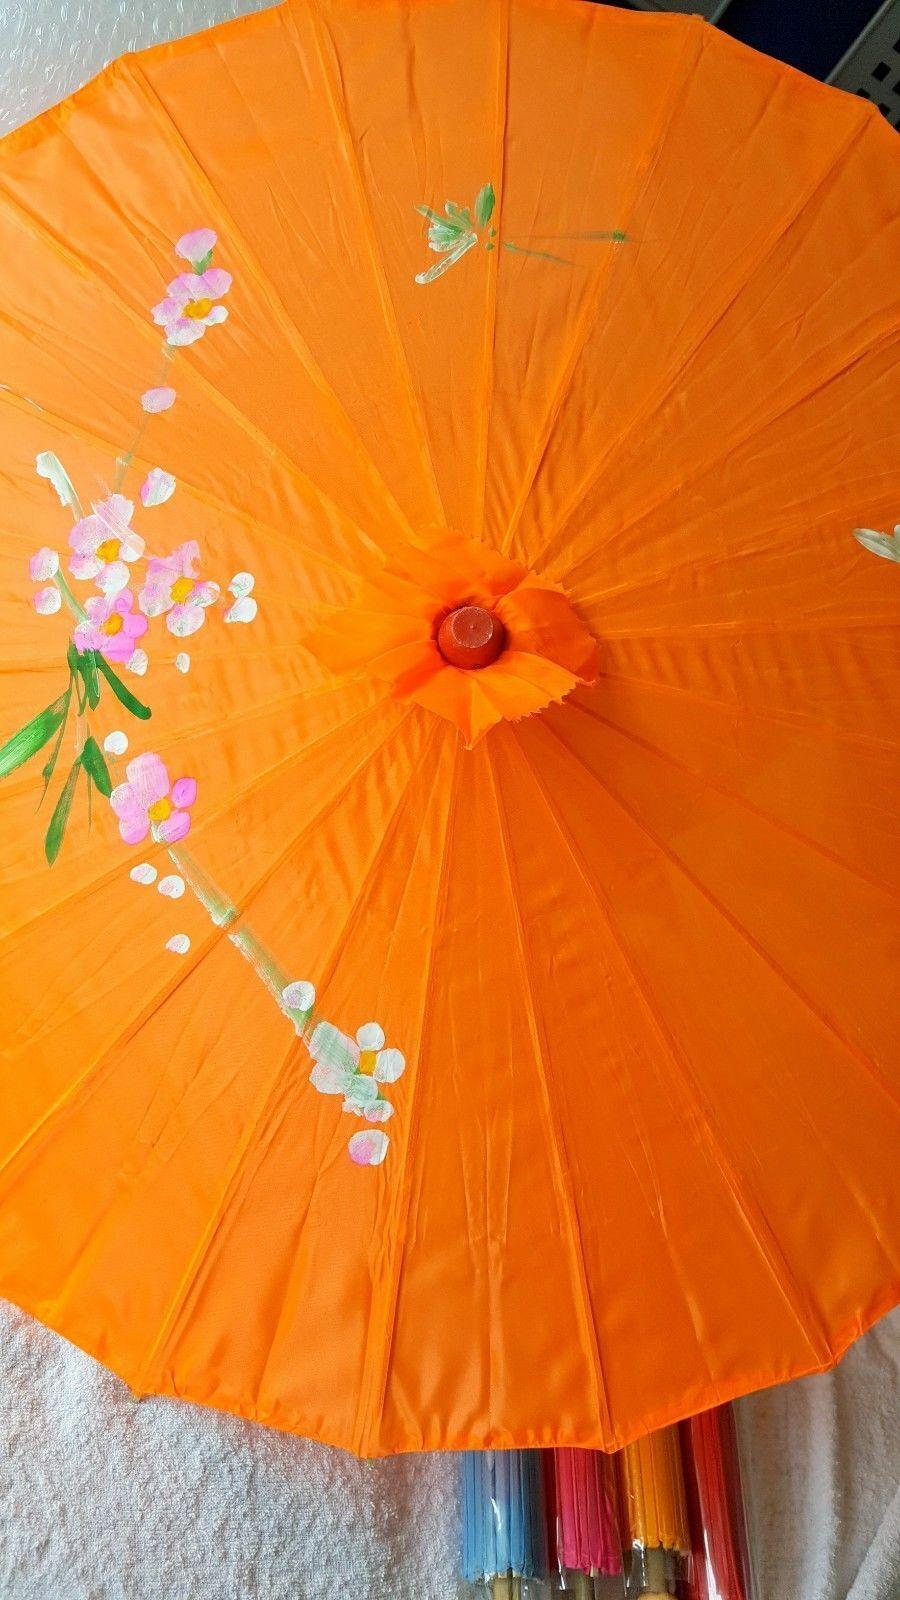 Joblot of 10 Chinese Silk & Bamboo Umbrella Parasol New Wholesale 4